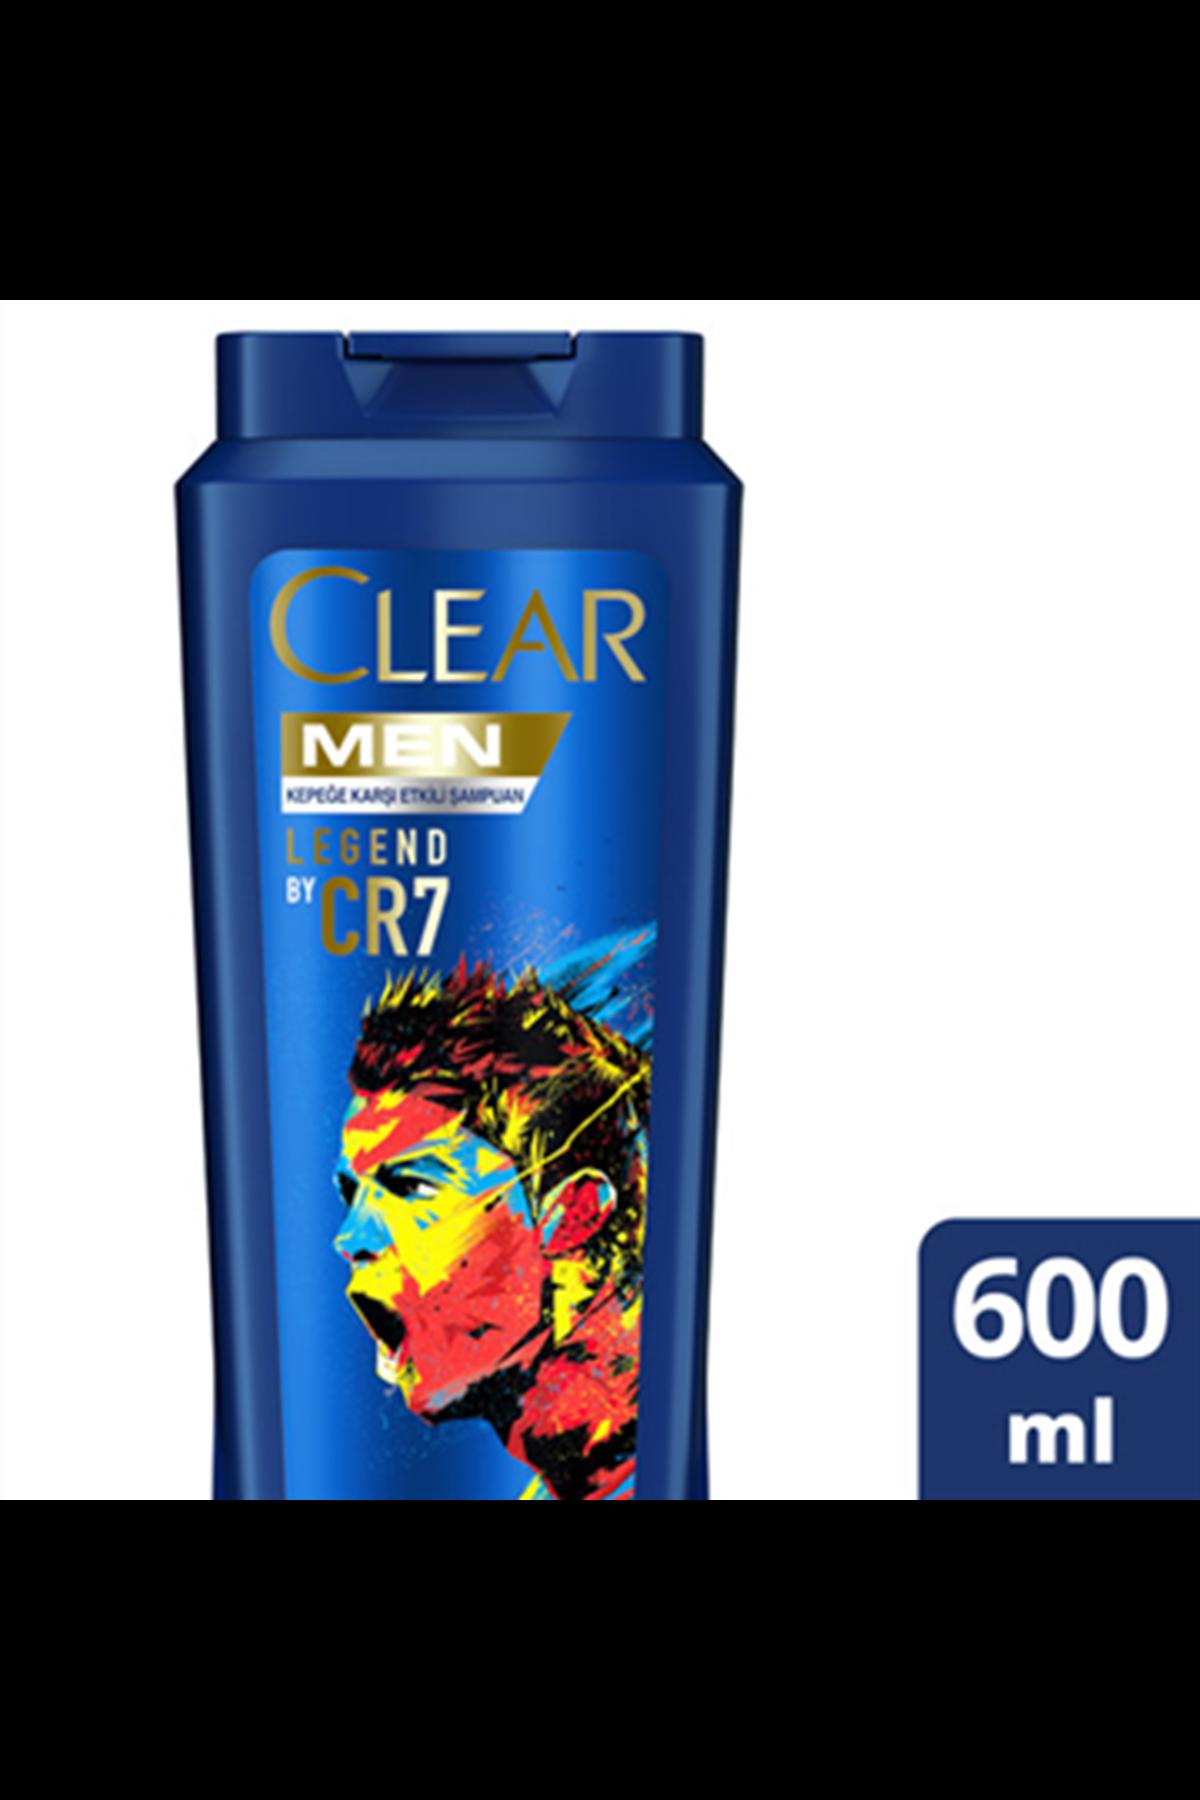 Clear Men Sampuan 600 ML Ronaldo Special Edition